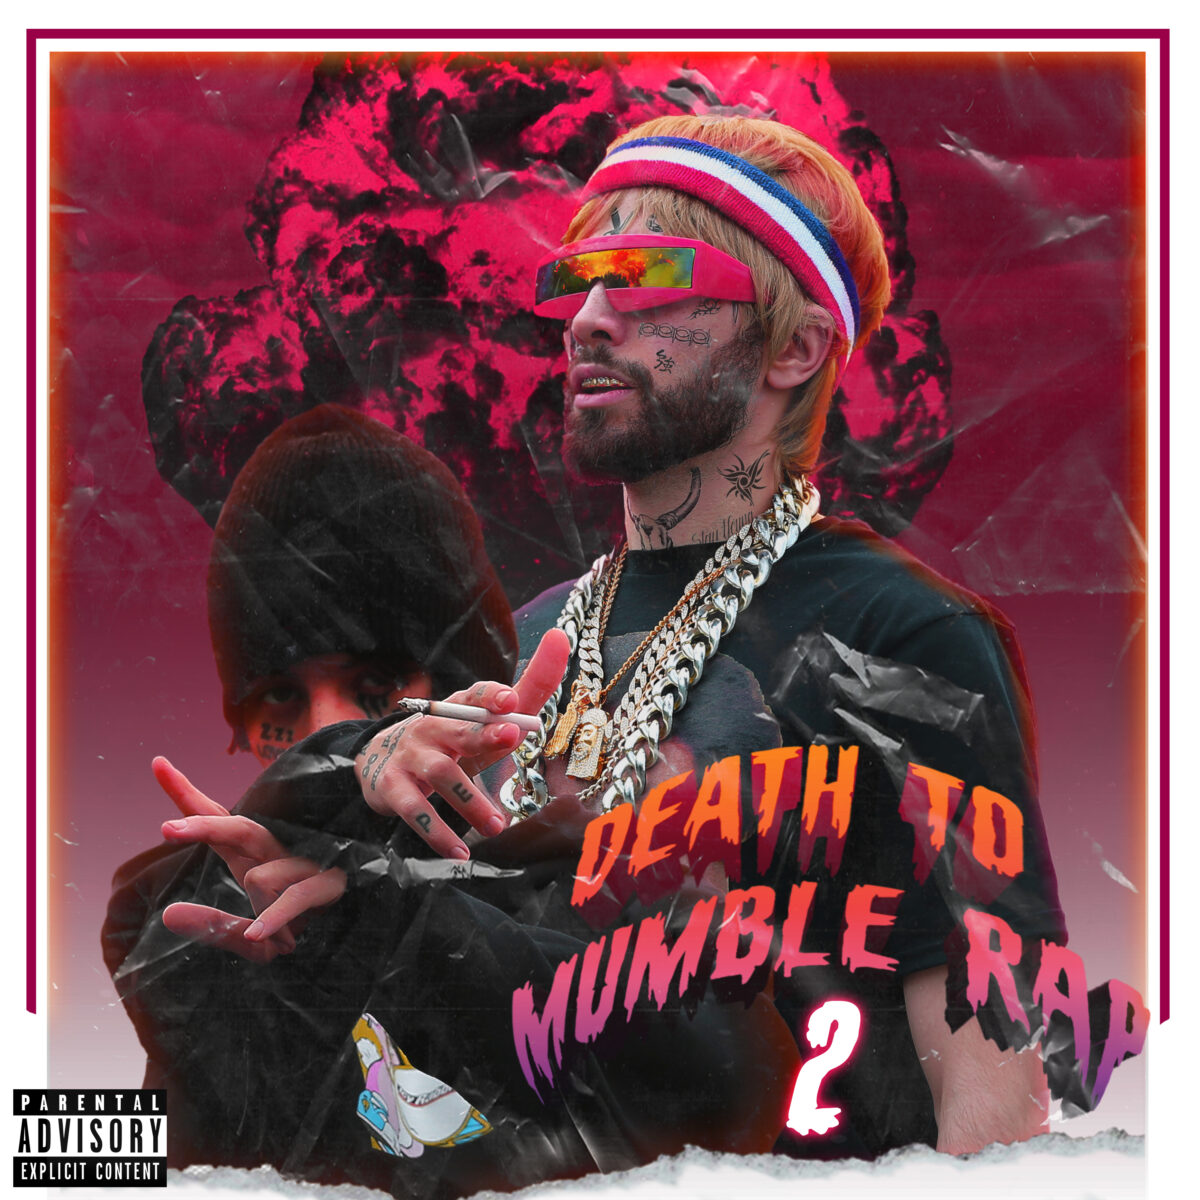 death to mumble rap 2